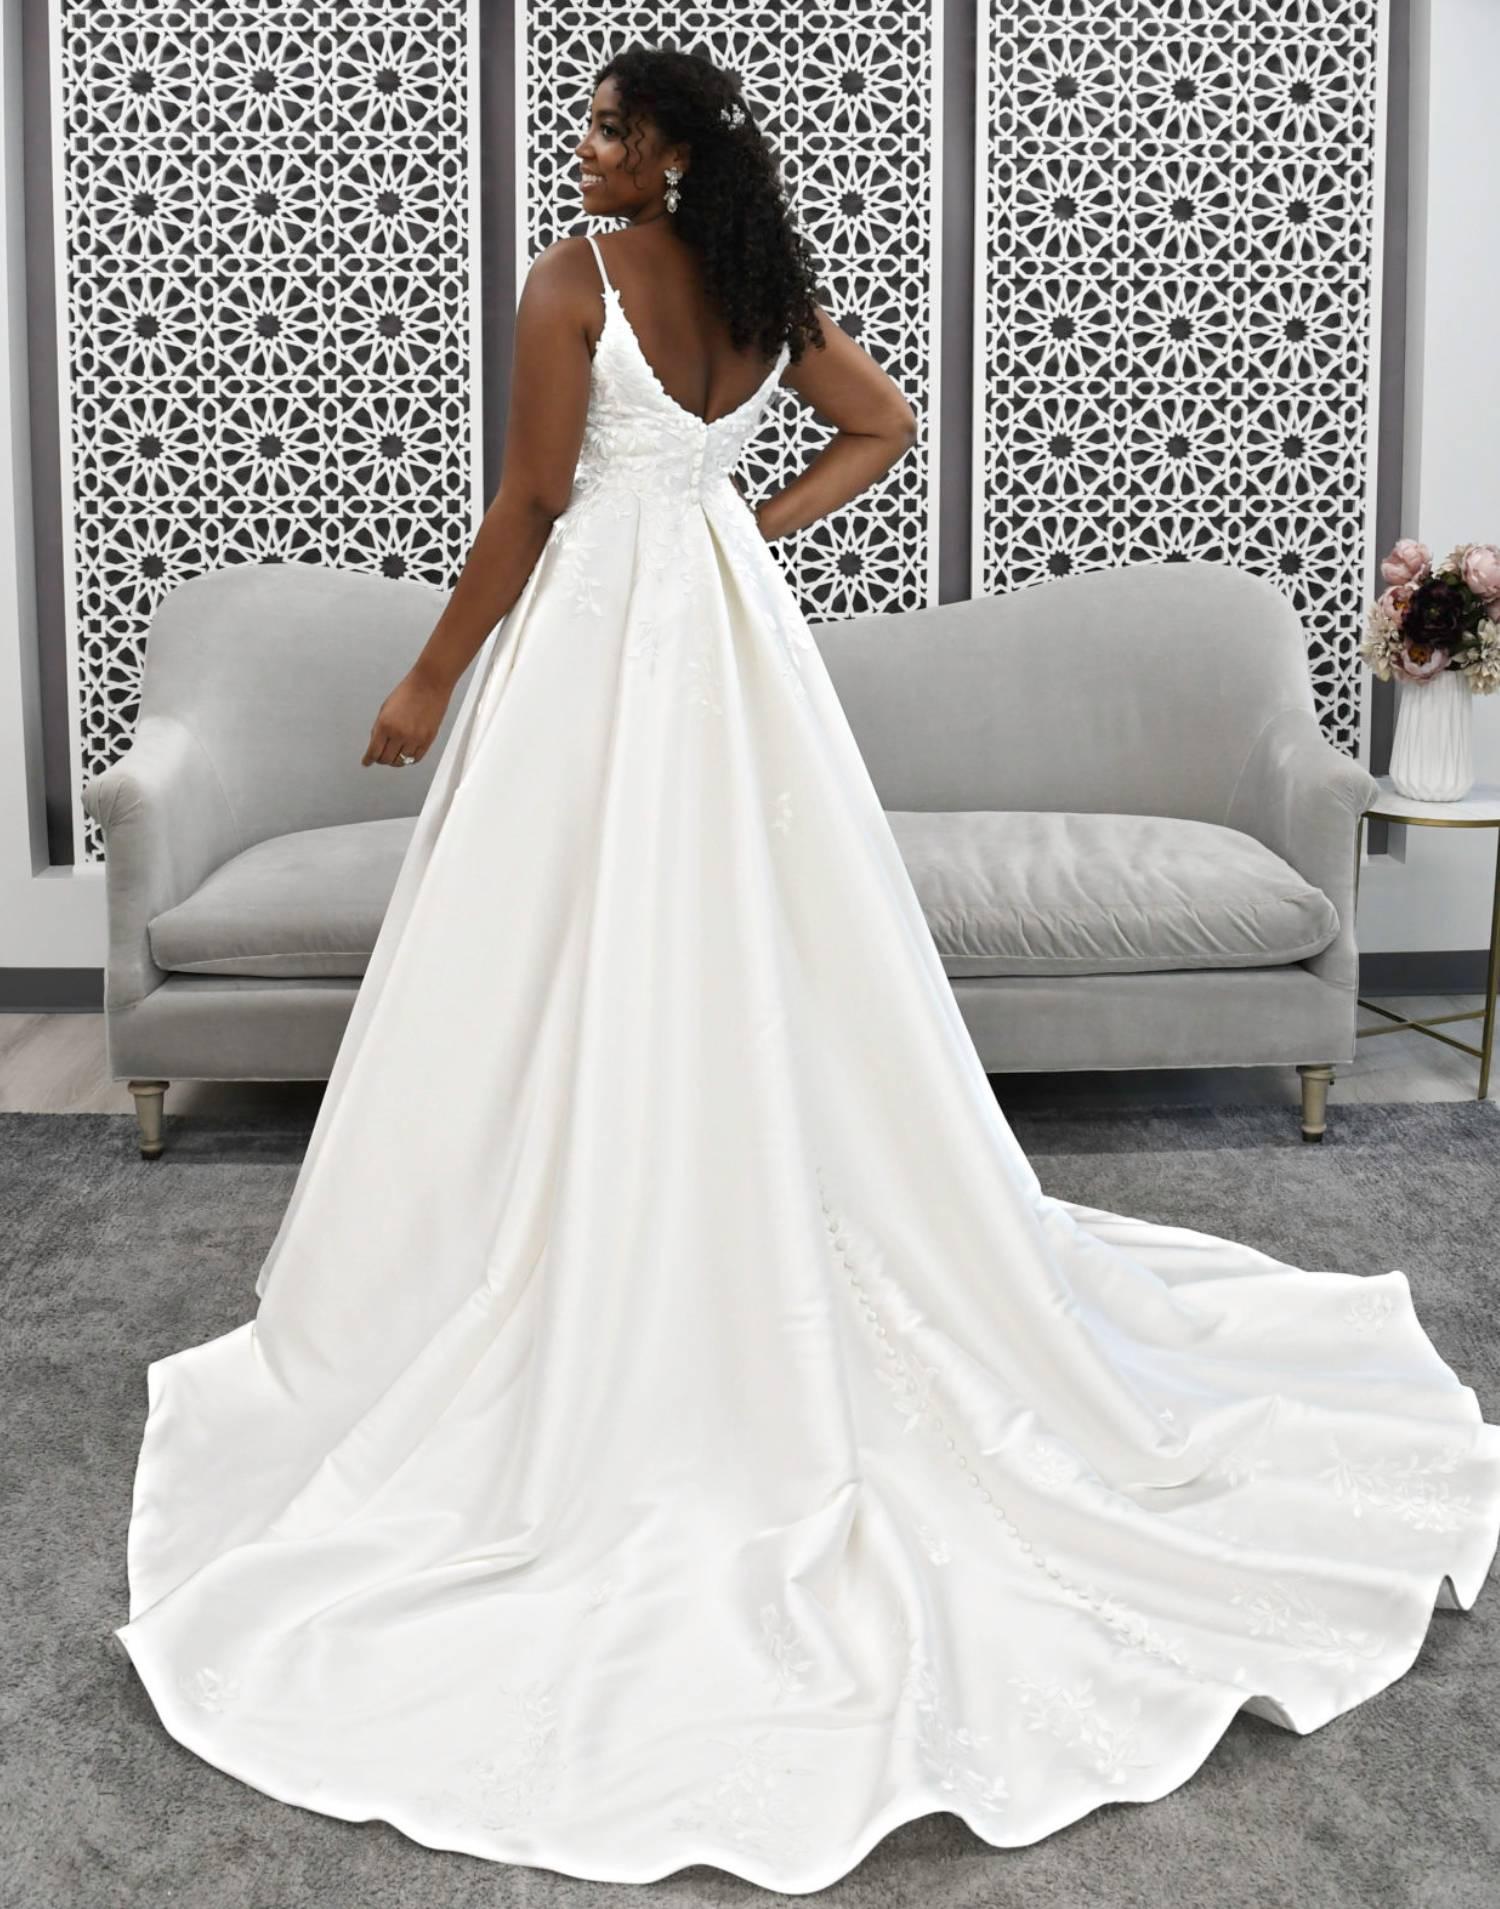 7048-wedding-dress-Stella-York-front-view-min